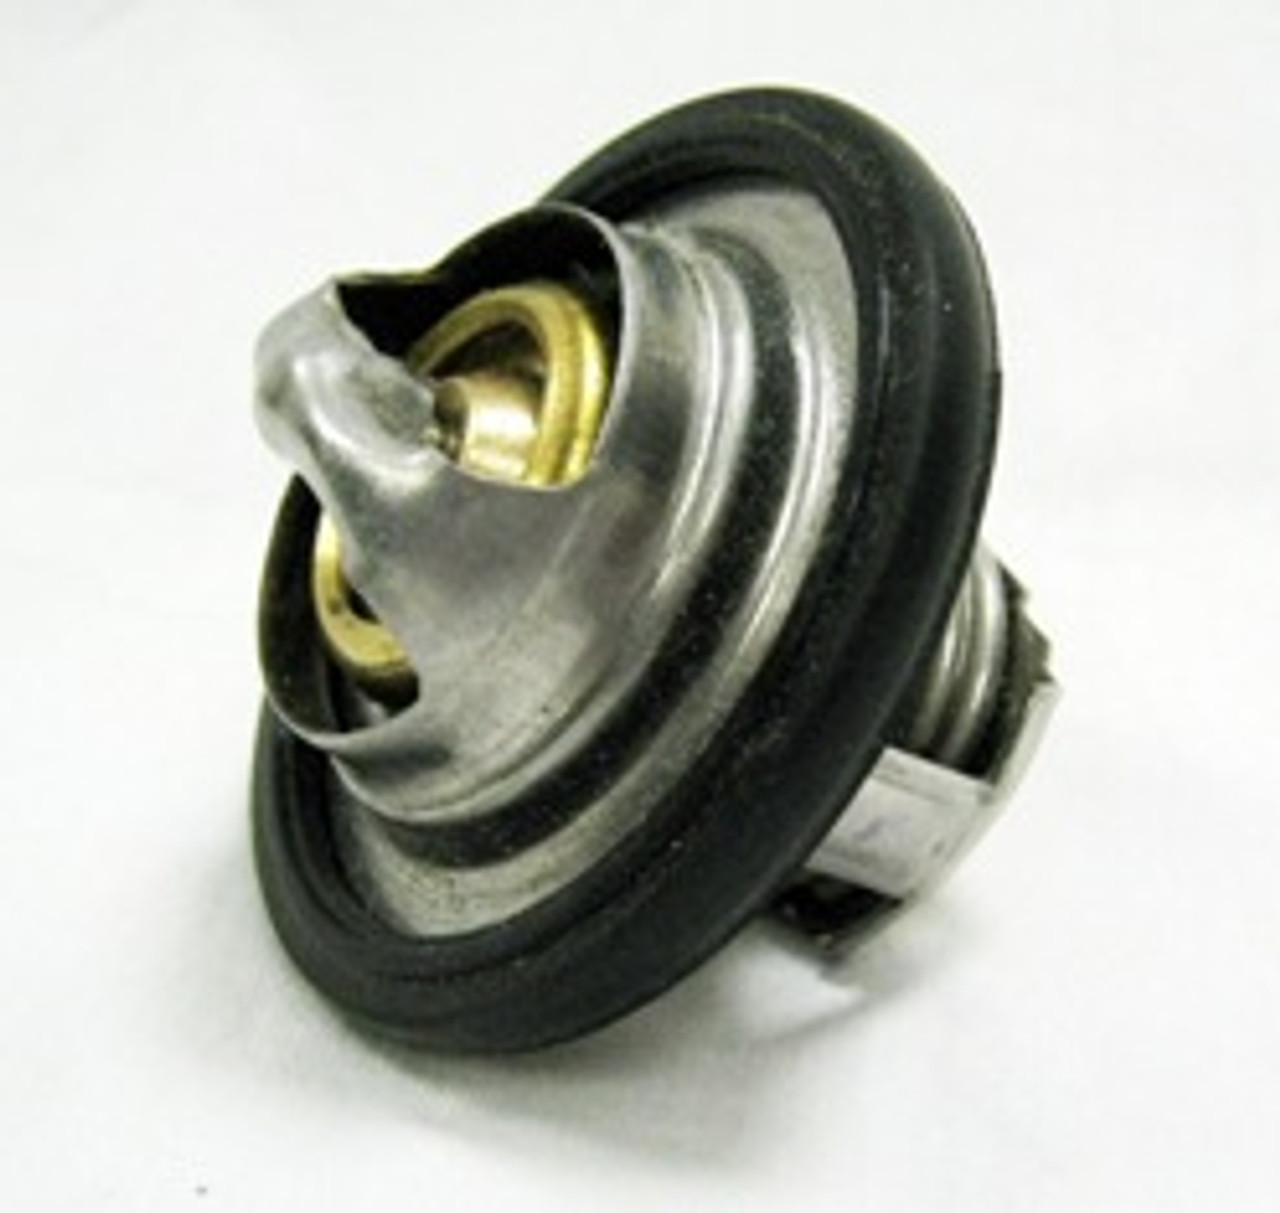 Yamaha RZ350/ RD350 YPVS Thermostat, 29L-12411-00-00